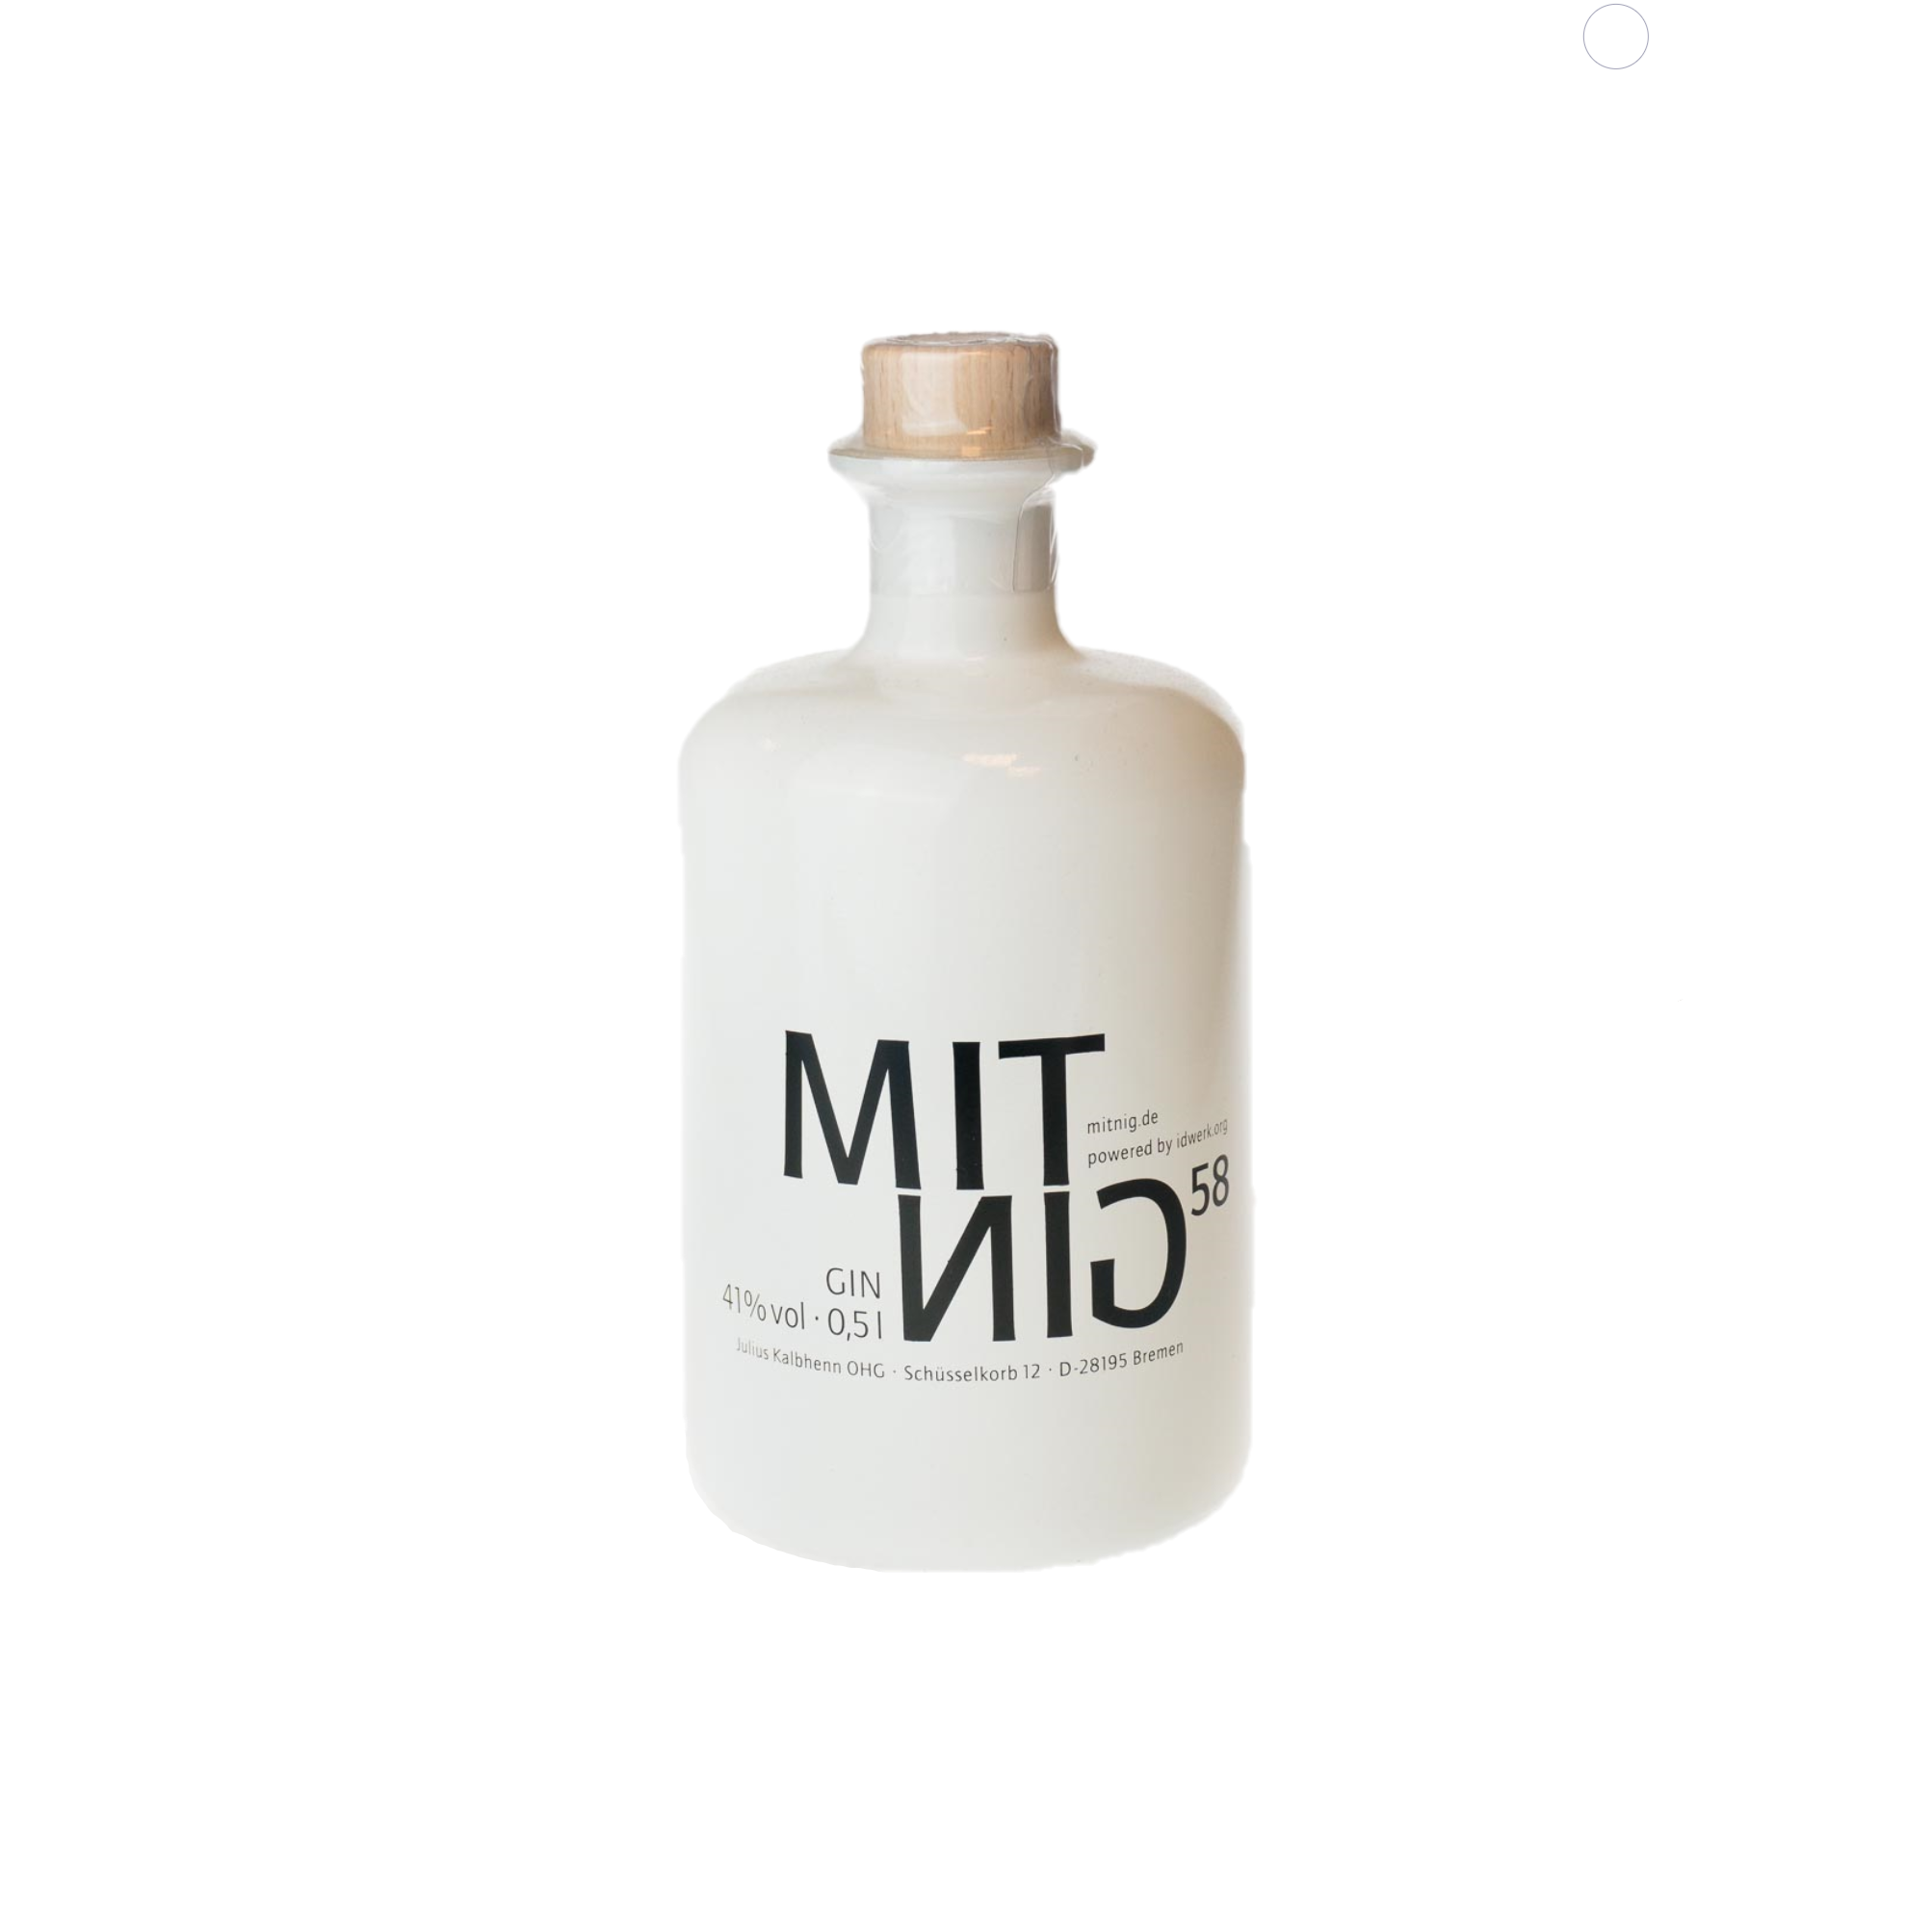 MITNIG 58